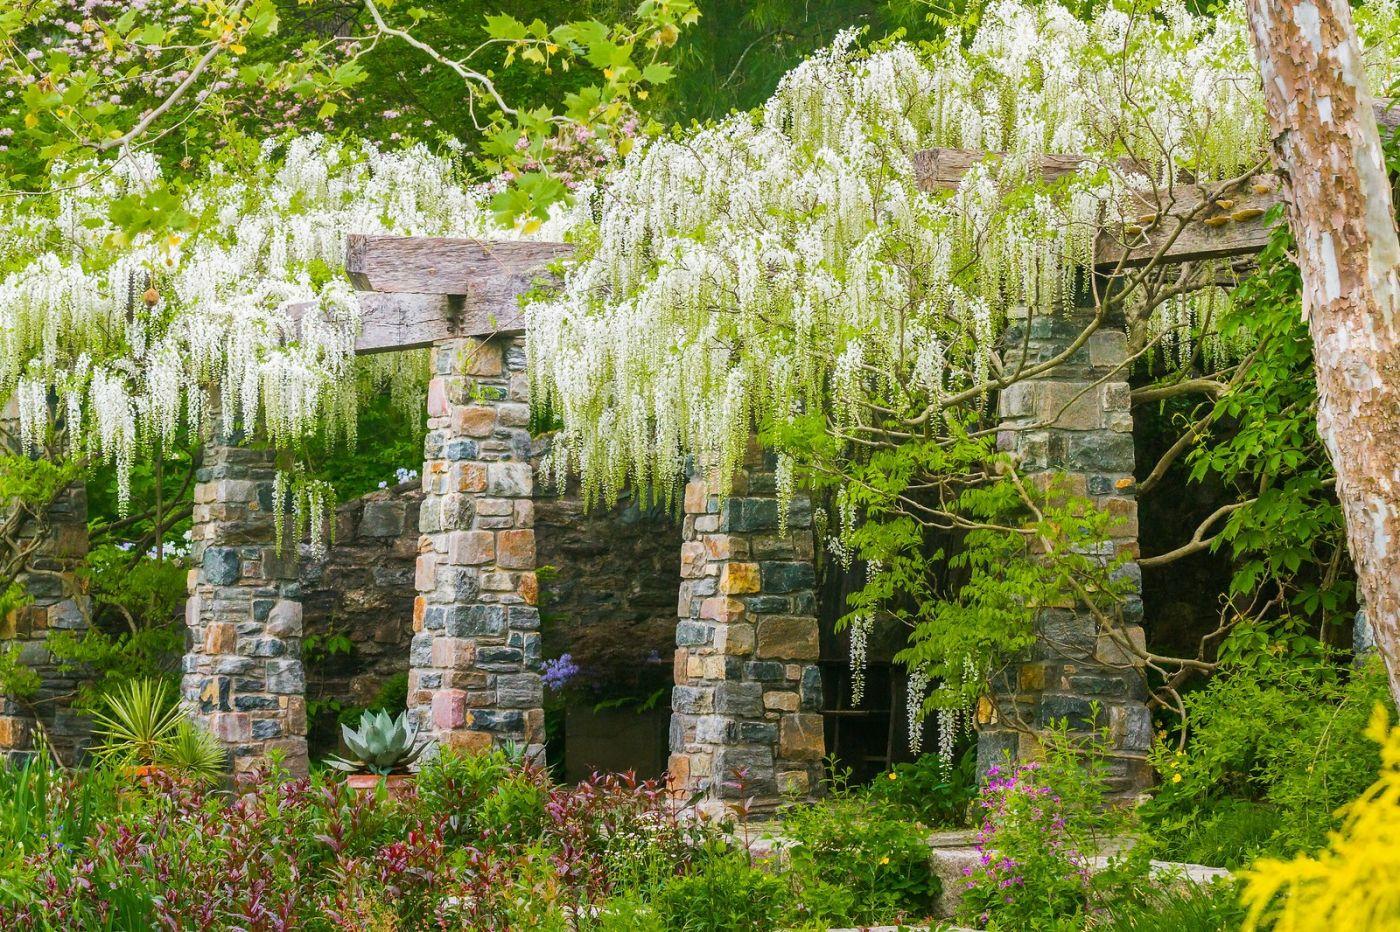 Chanticleer花园,那年盛开的紫藤花_图1-3